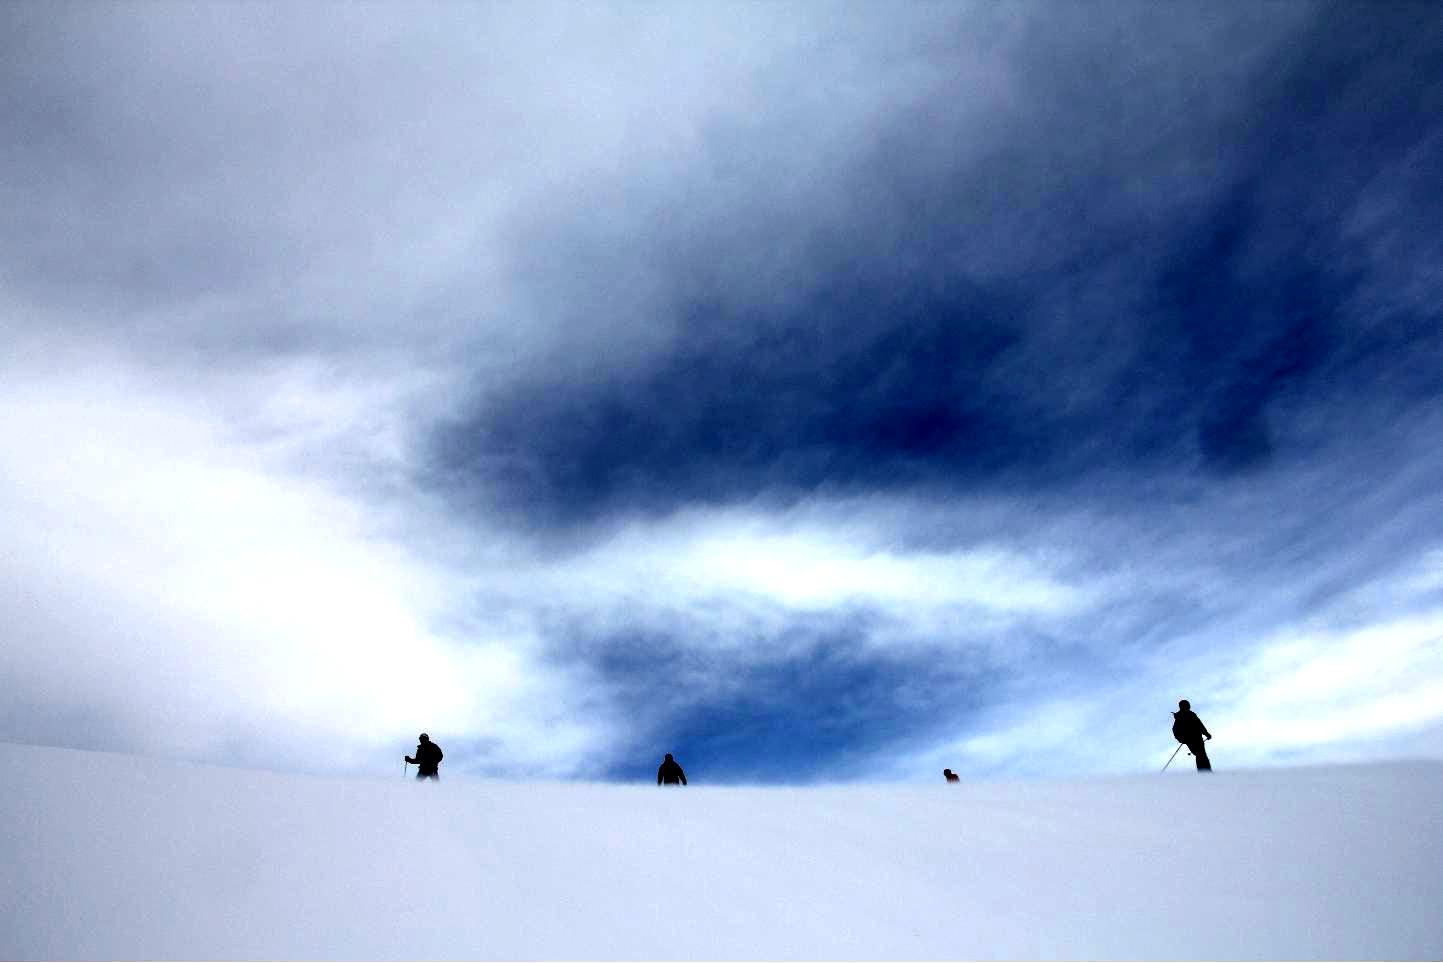 Stick skiers © JonoVernon-Powell